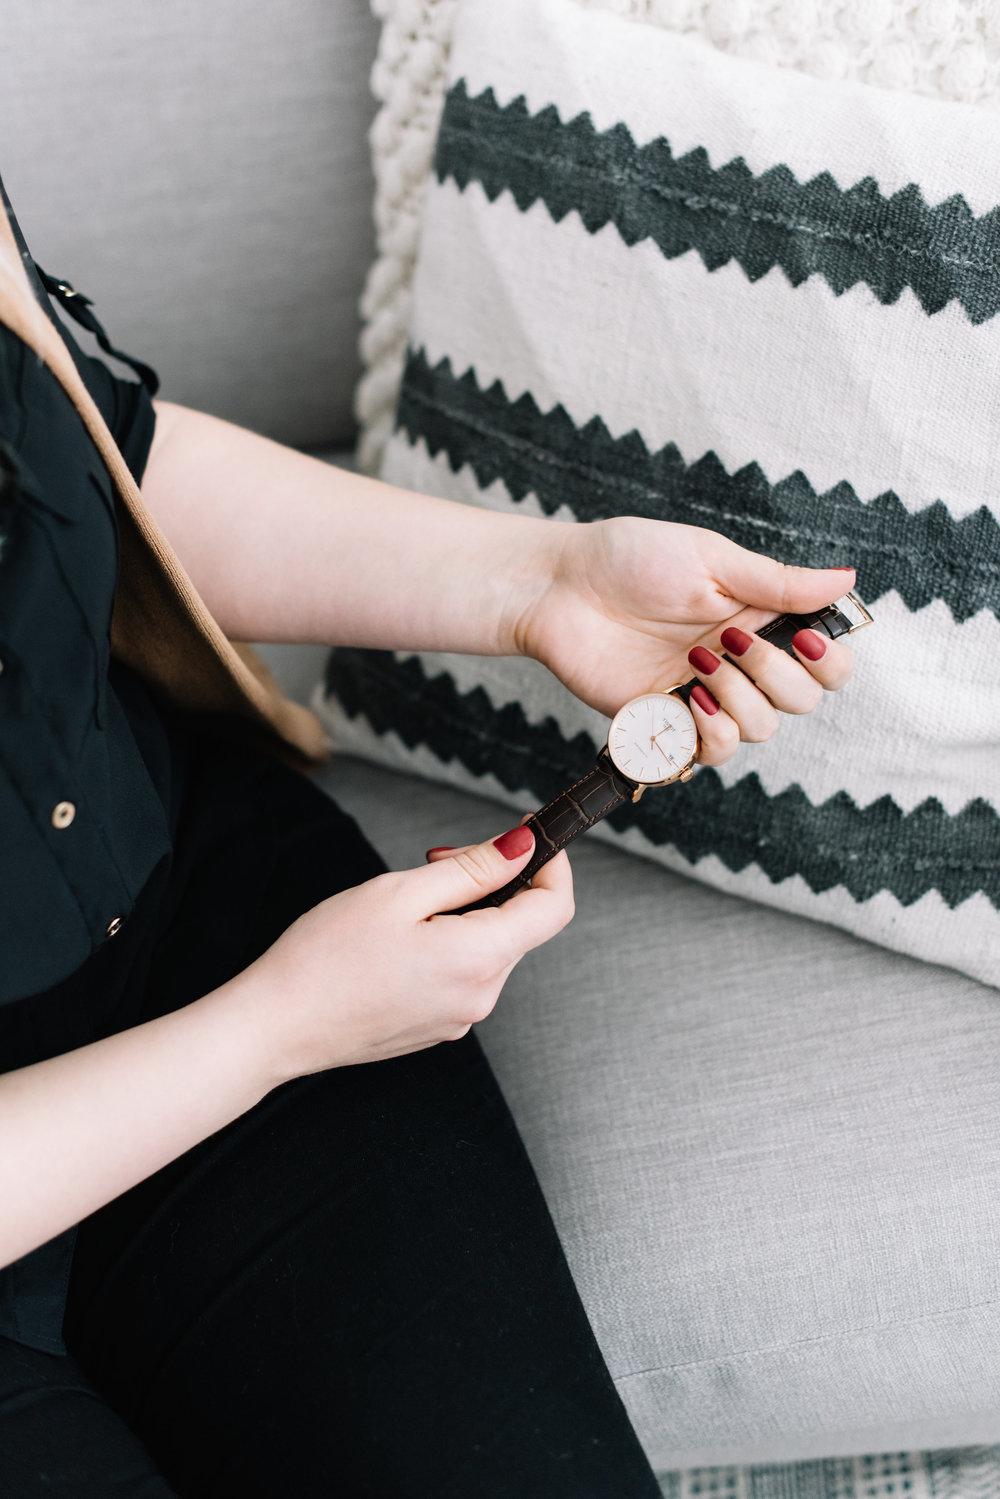 tissot watch, gift idea